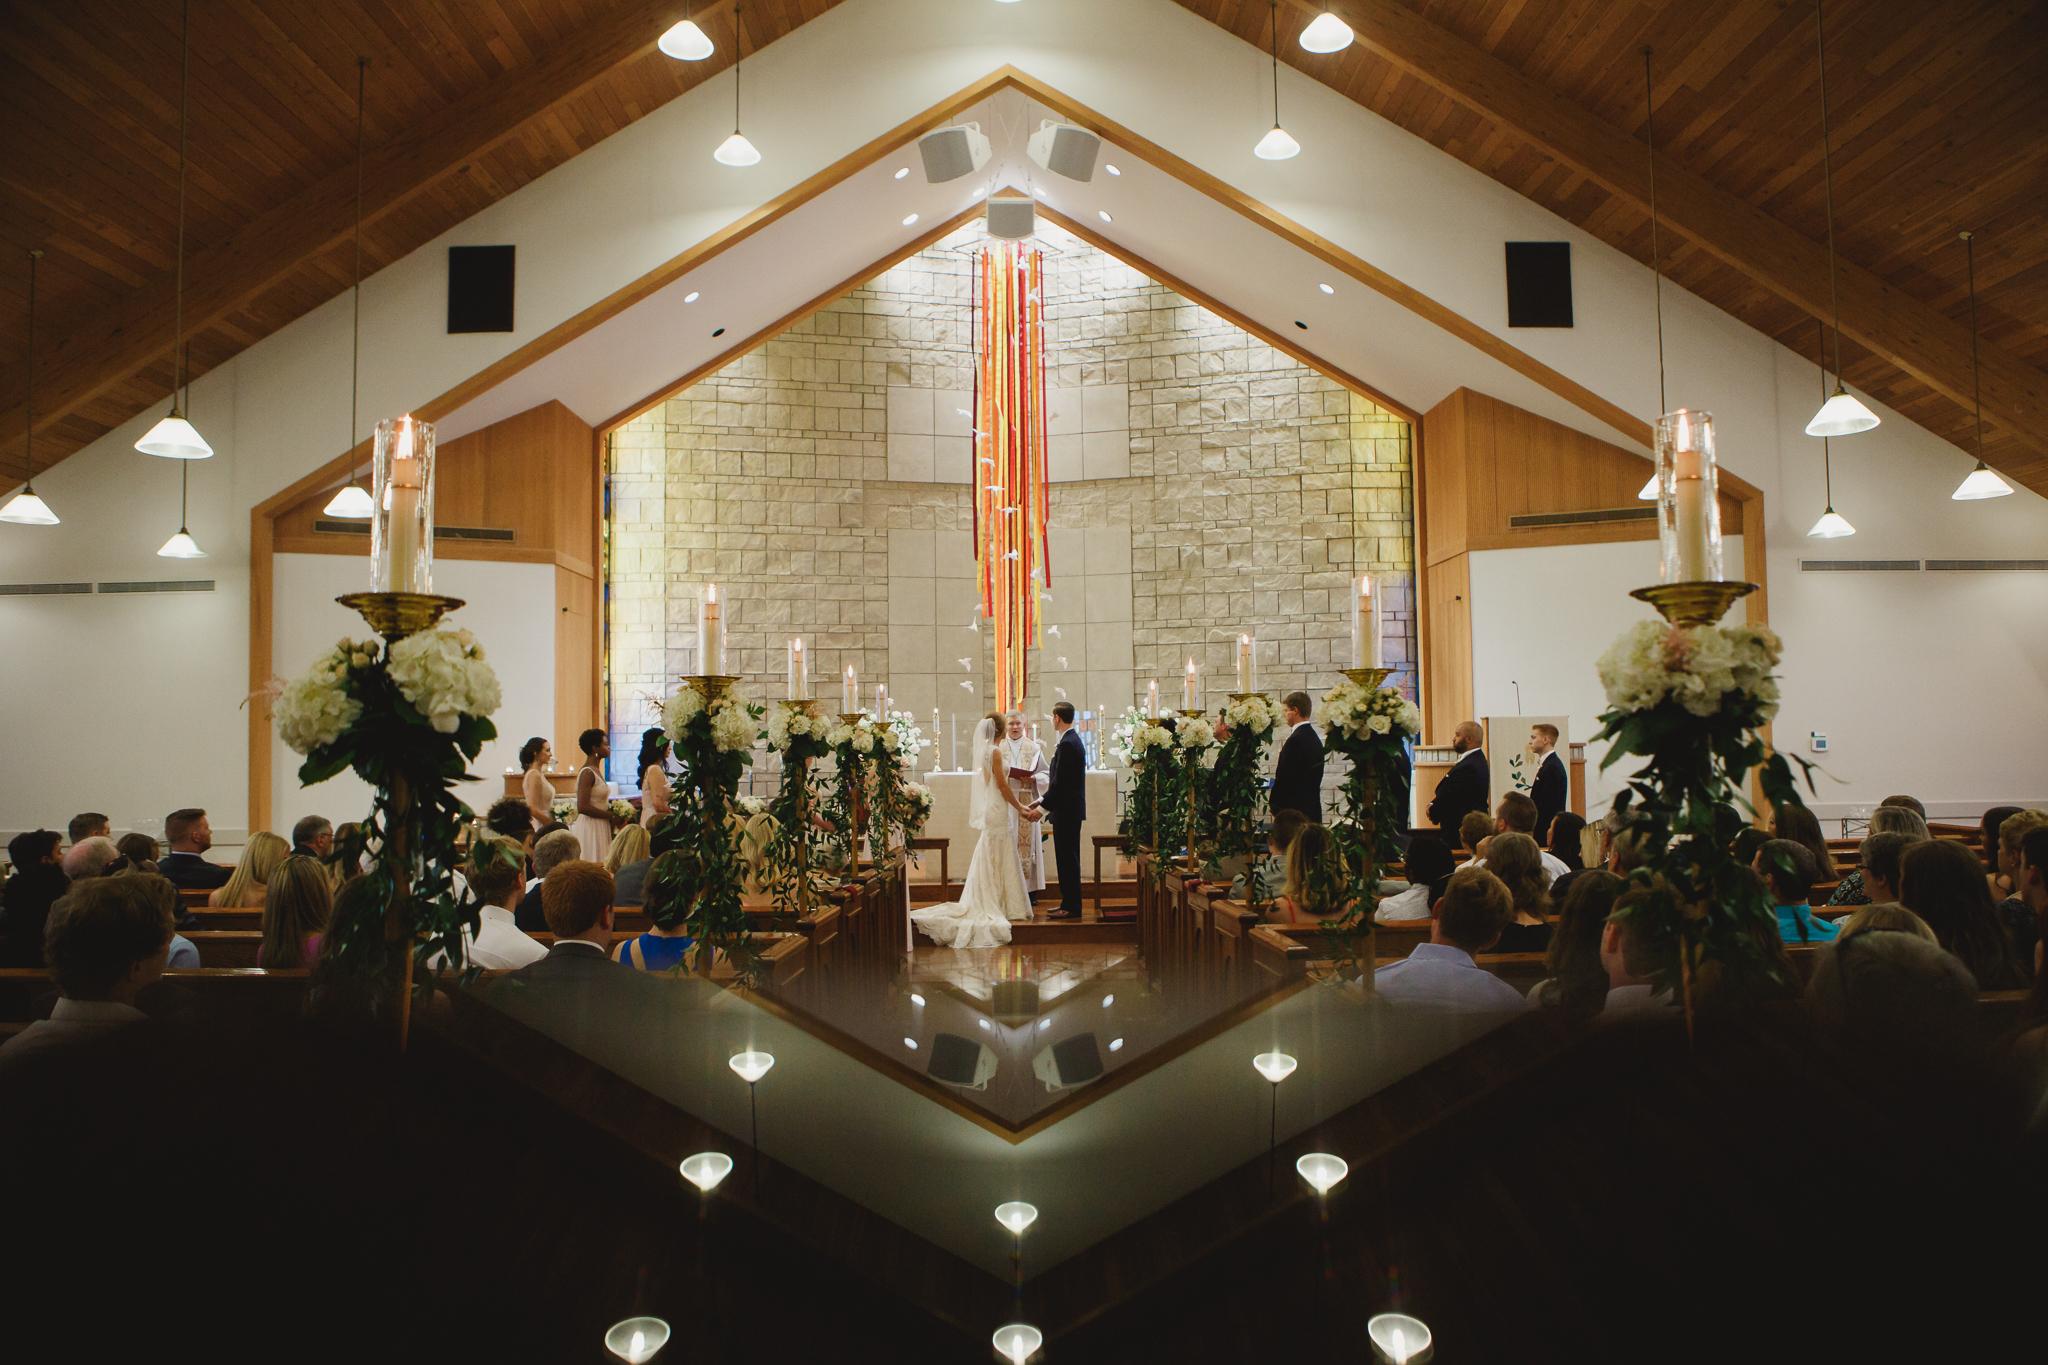 Michael and Kelly - the ashton depot - wedding DFW - wedding photographer- elizalde photography (44 of 150).jpg